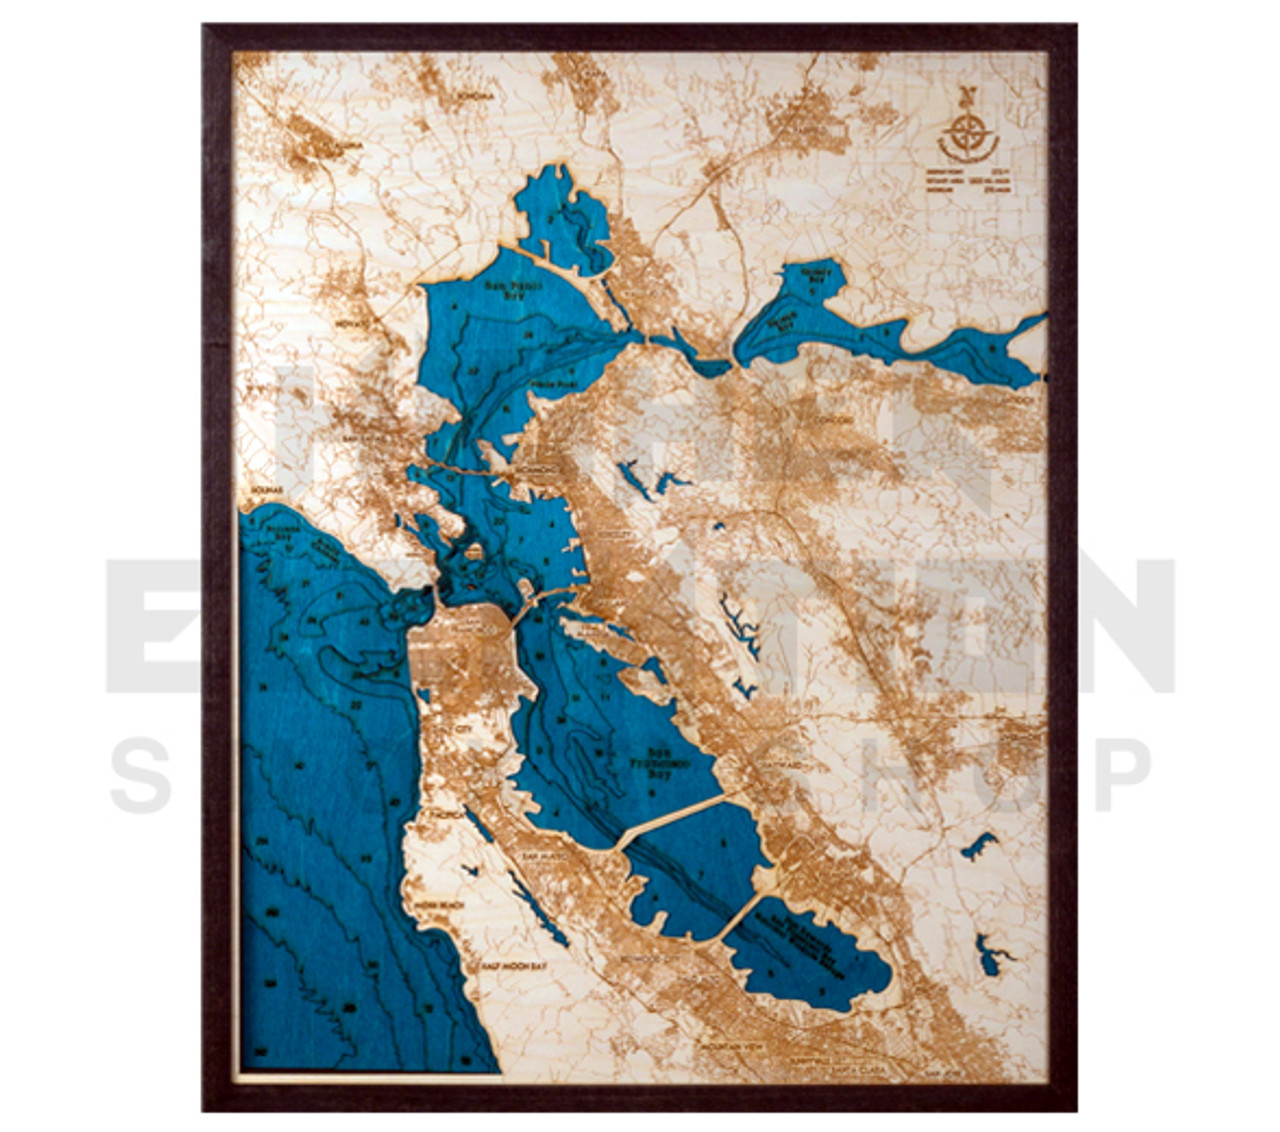 3d Wood Map San Francisco Bay Area Large 31 X 24 Higher Elevation